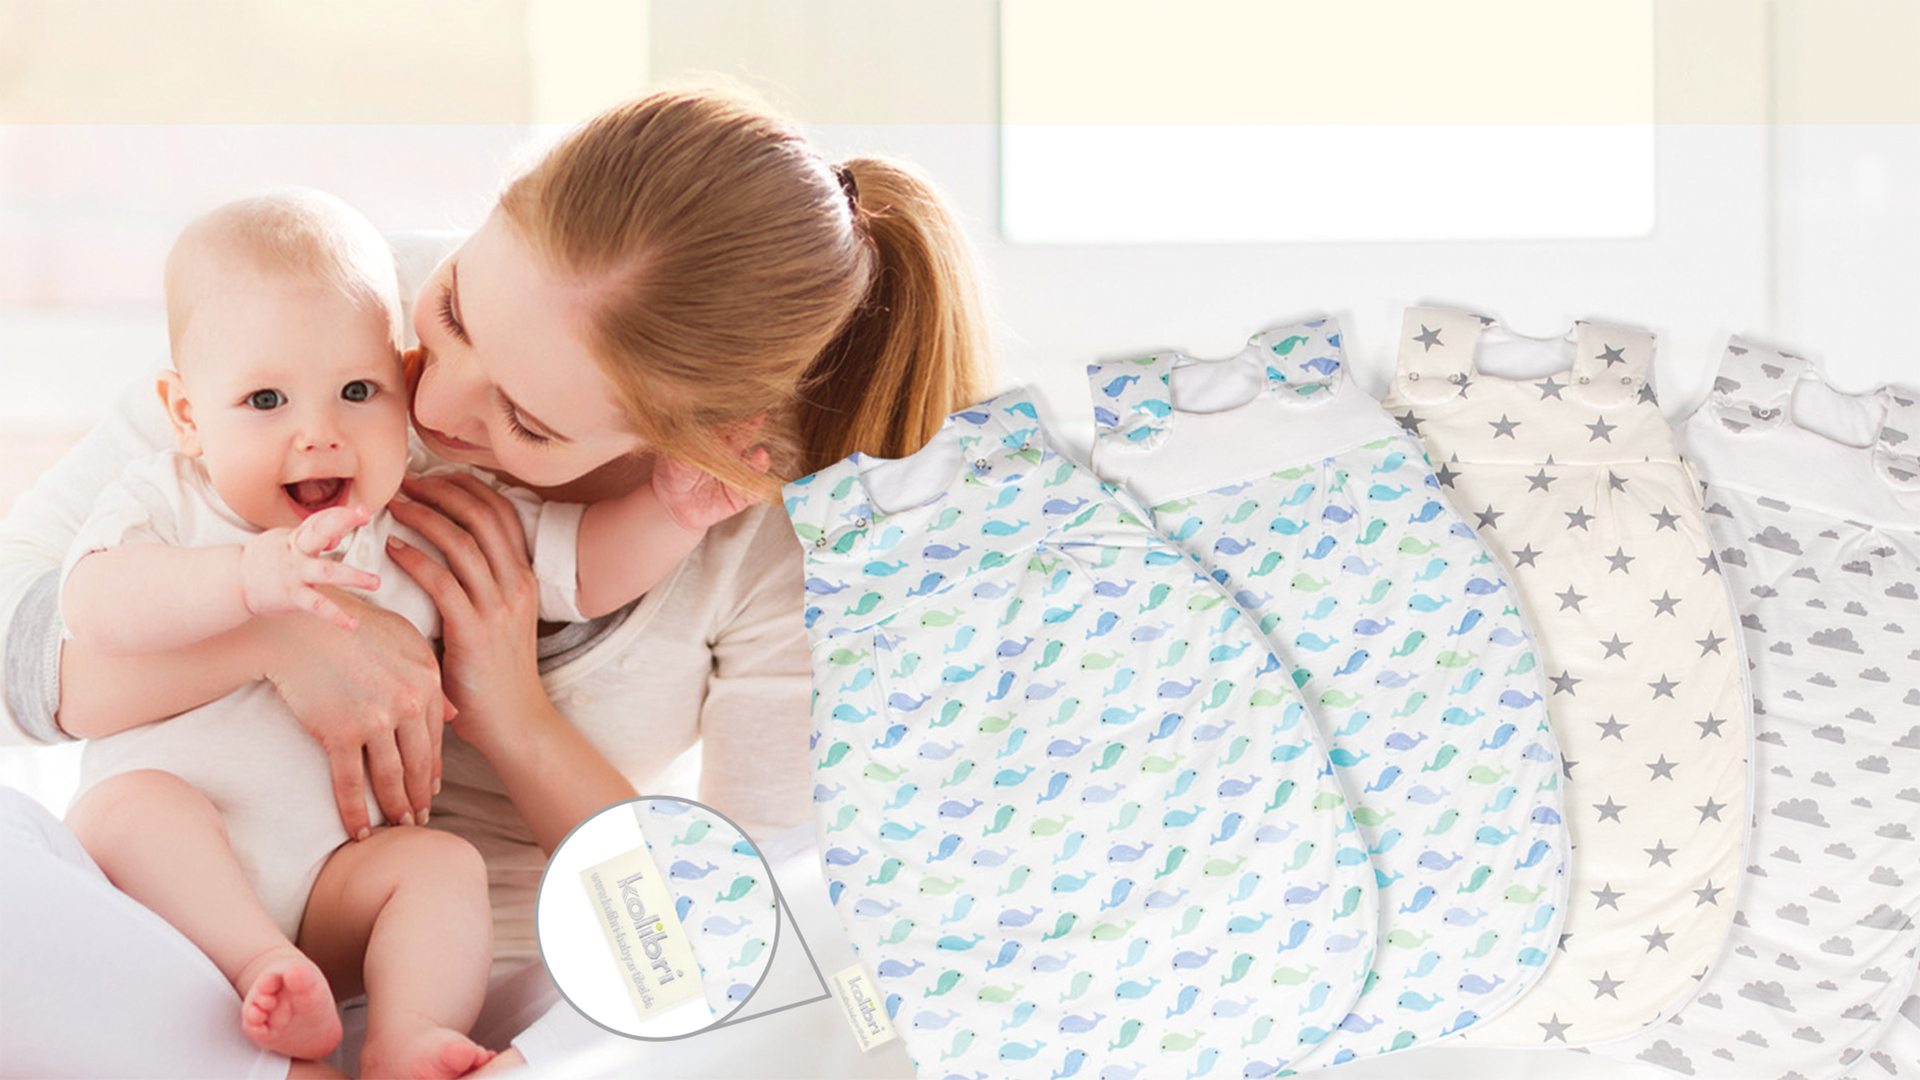 Individuelle Babyartikel Babyschlafsäcke Klinikzubehör